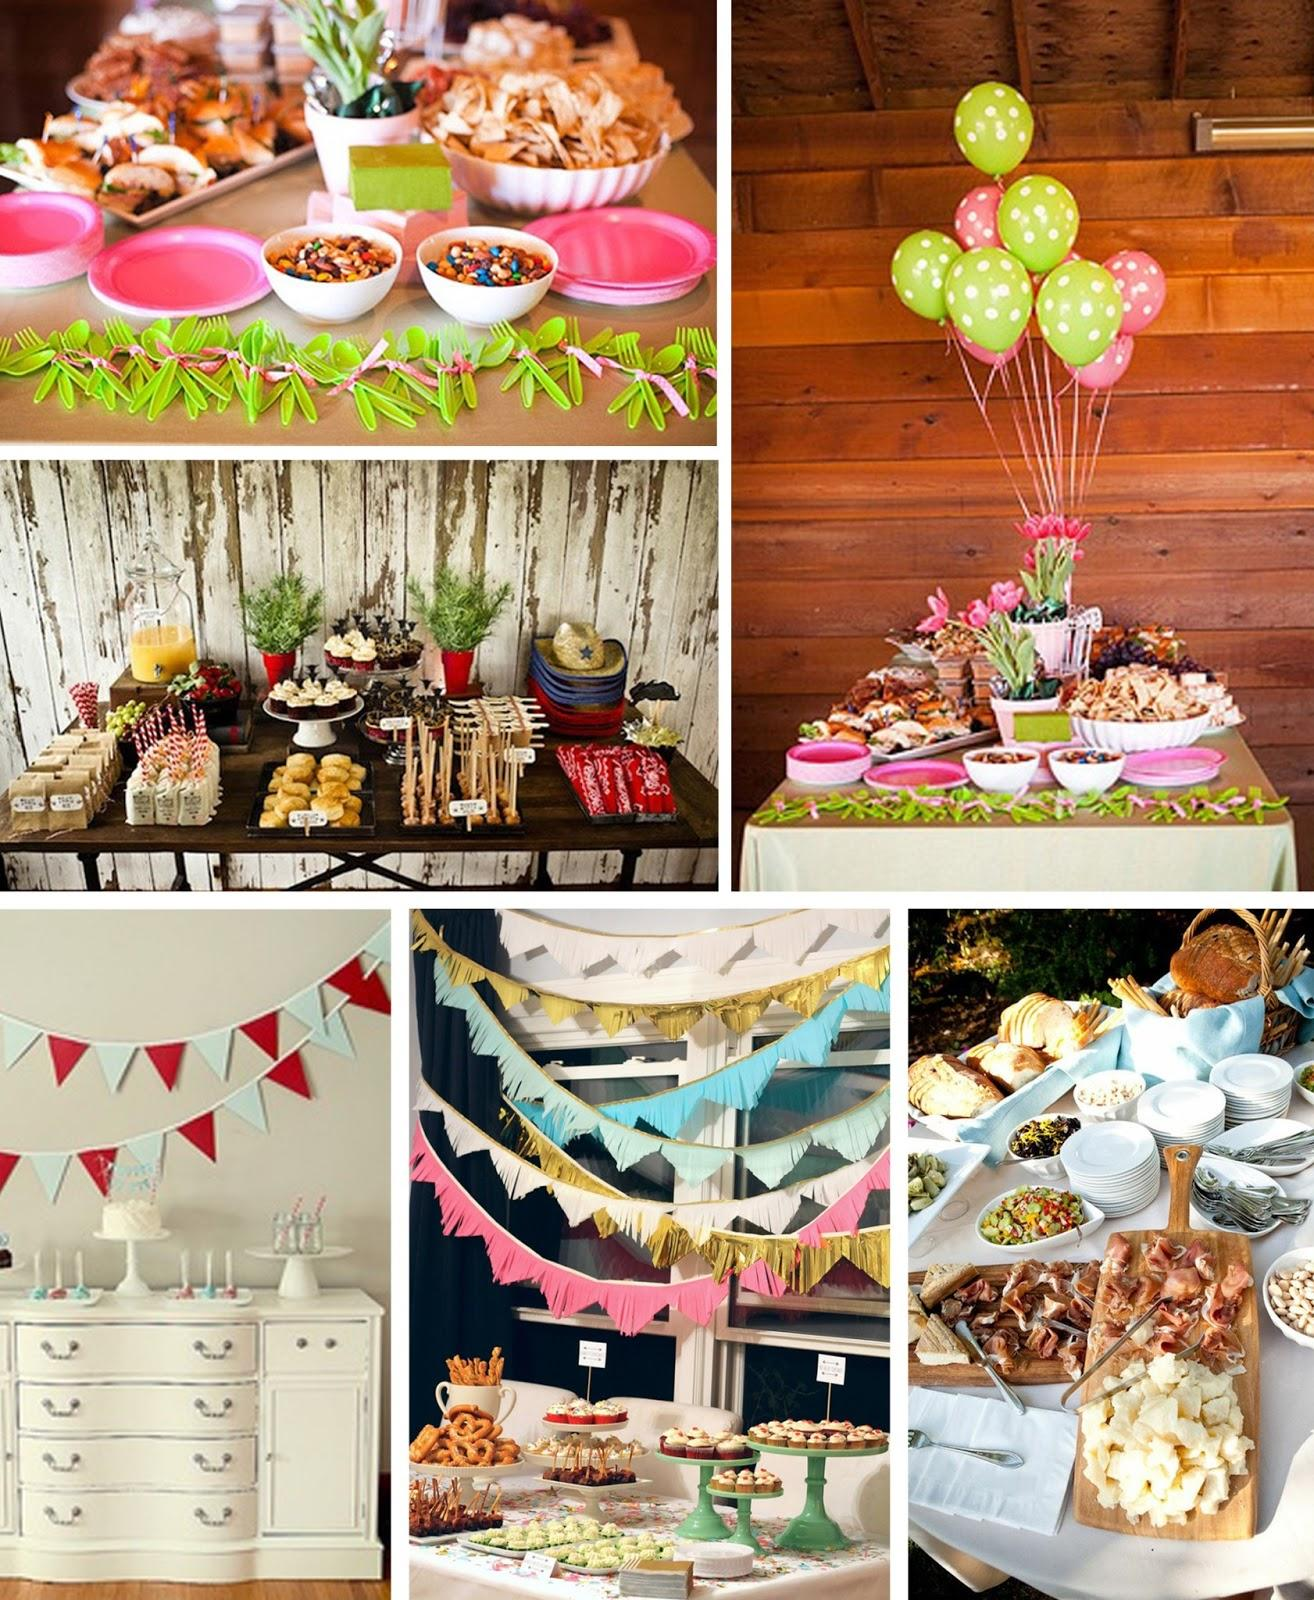 Detalles para una fiesta infantil paperblog - Fiesta cumpleanos infantil en casa ...